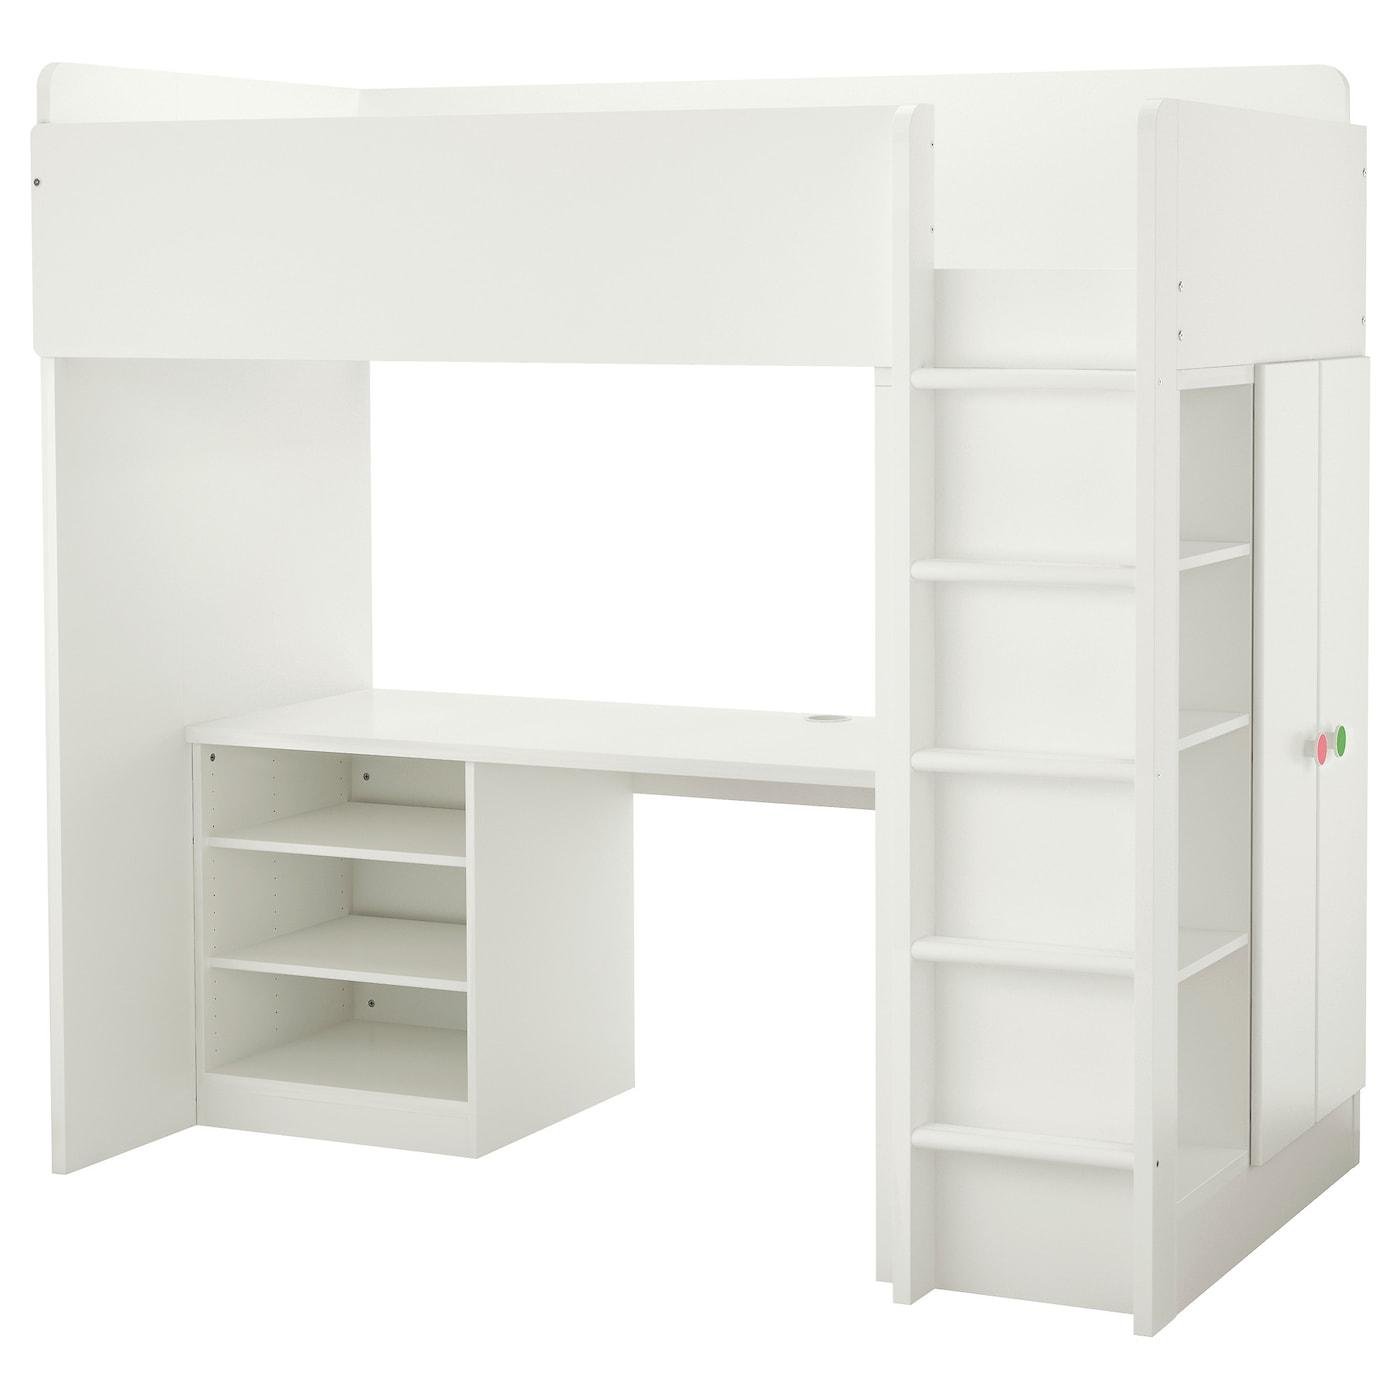 STUVA F–LJA Loft bed bo w 2 shelves 2 doors White 207x99x193 cm